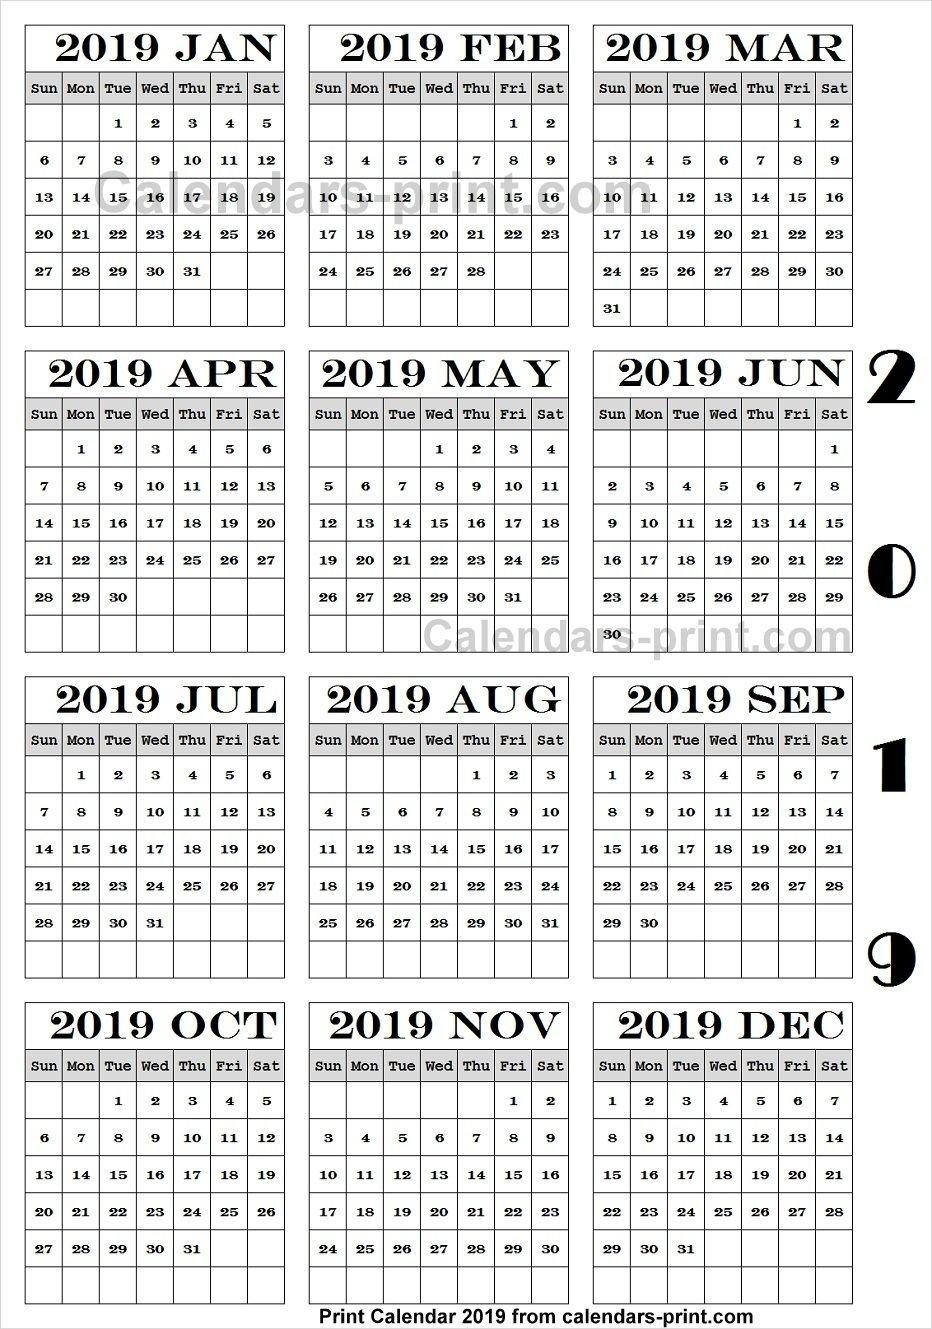 Calendar 2019 Pdf Download   2019 Yearly Calendar   Print Calendar Calendar 2019 Romana